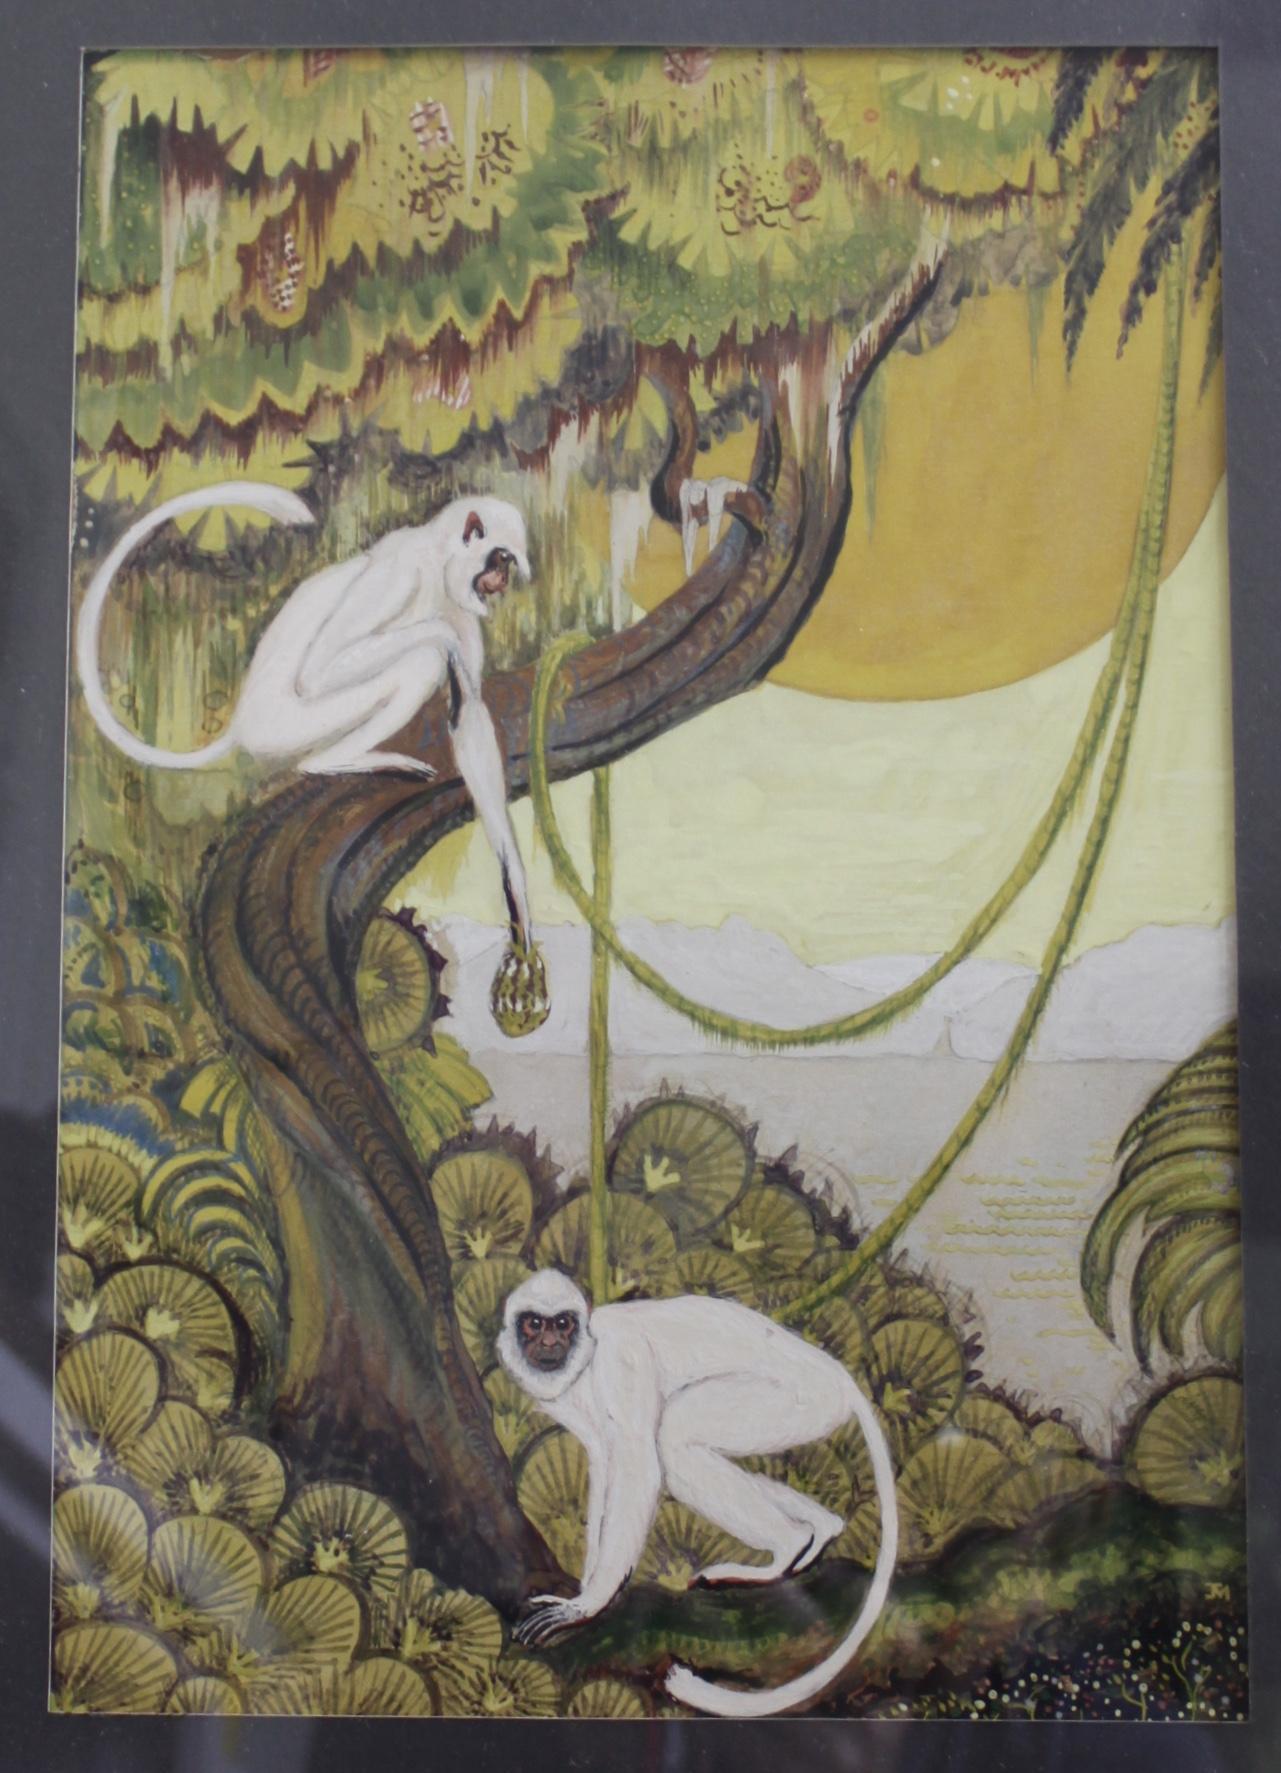 Art Deco Monkeys, Gouache Painting, Circa Late 1920u0026#39;s from decosurfn-rl on Ruby Lane